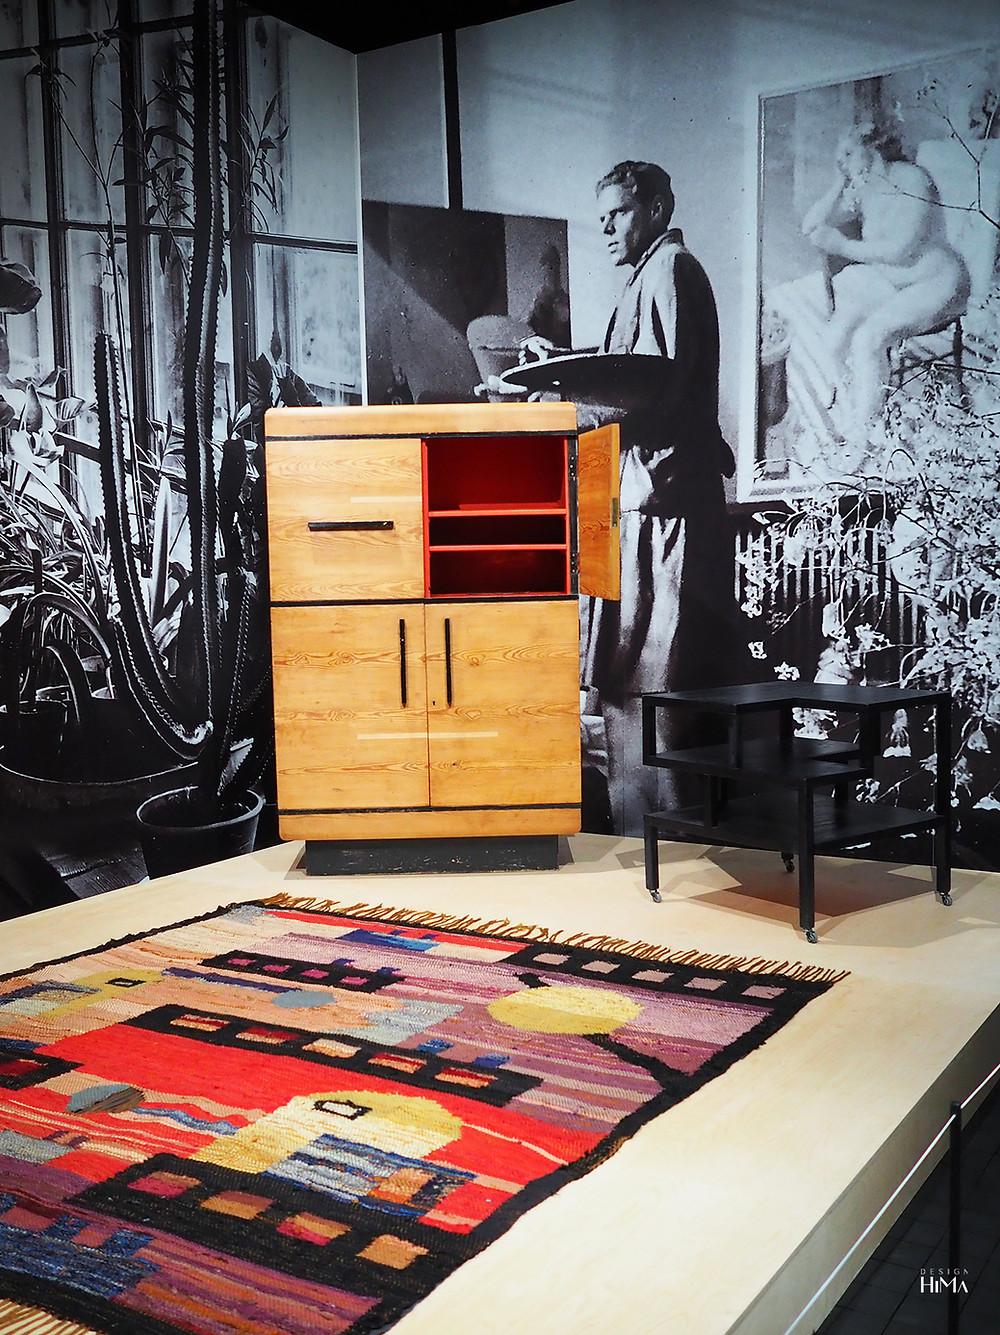 Birger Carlstedt matto ja kalusteet